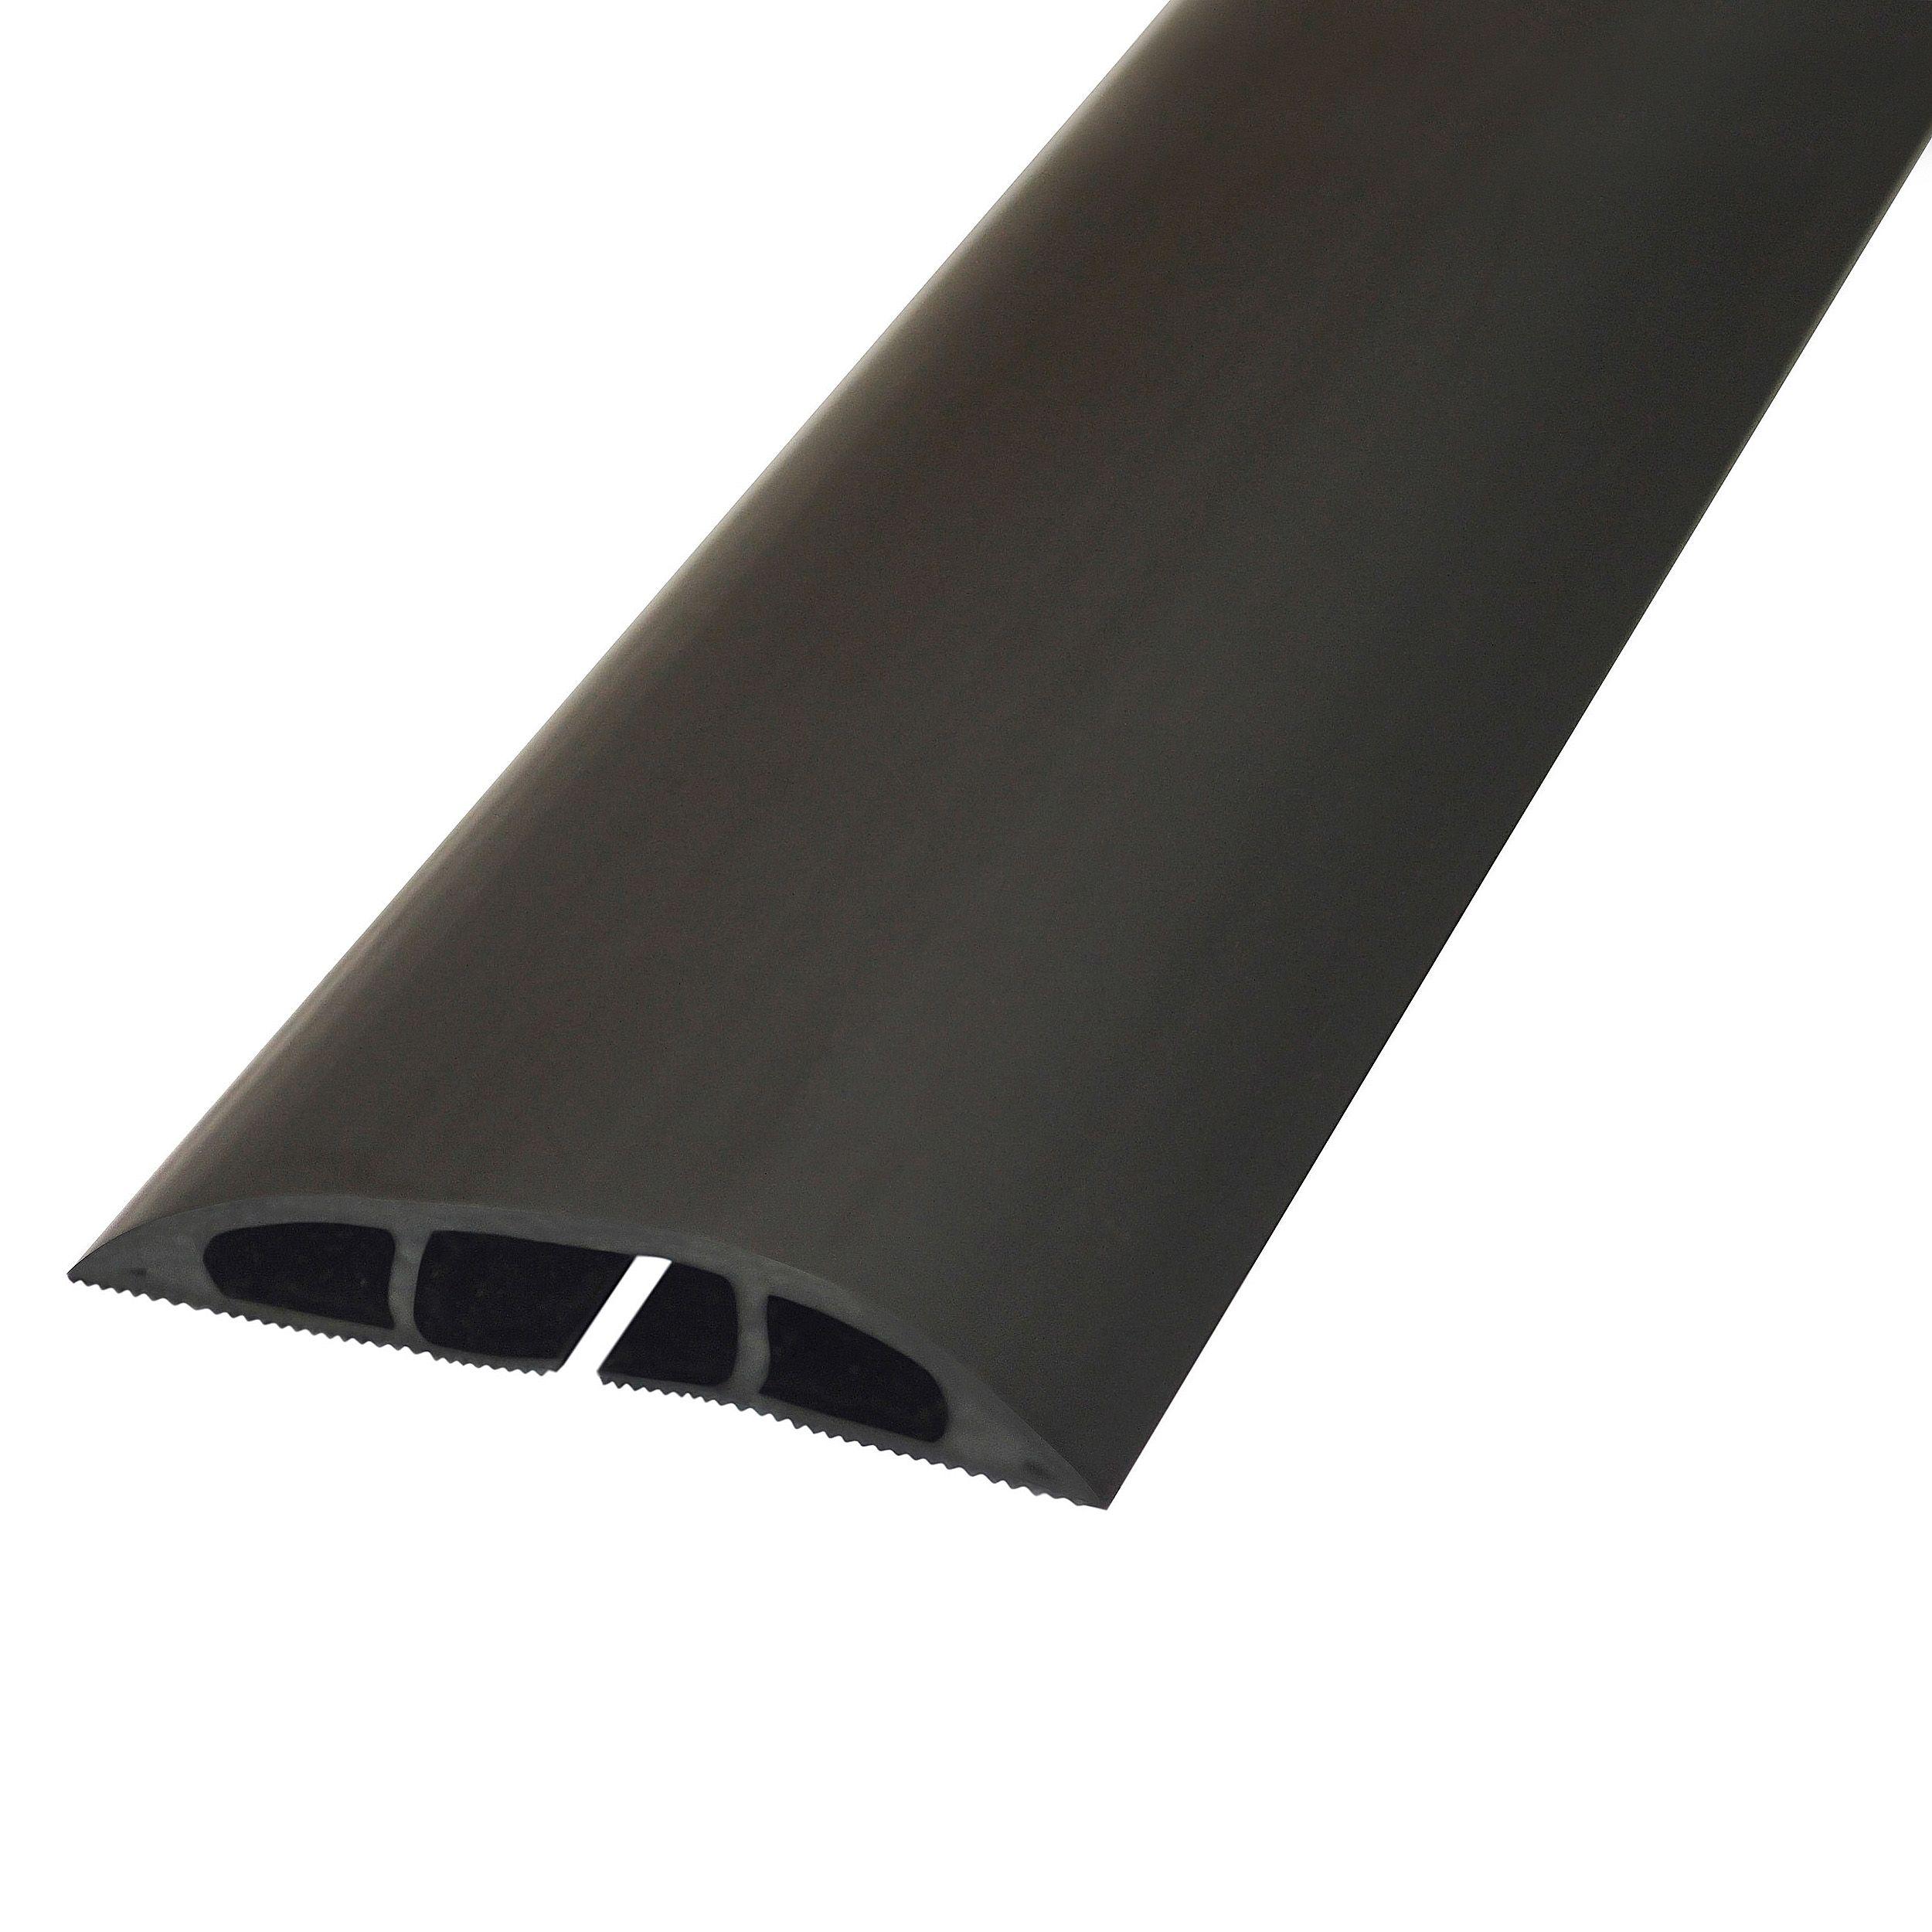 d line black plastic floor cable cover departments diy at b q. Black Bedroom Furniture Sets. Home Design Ideas